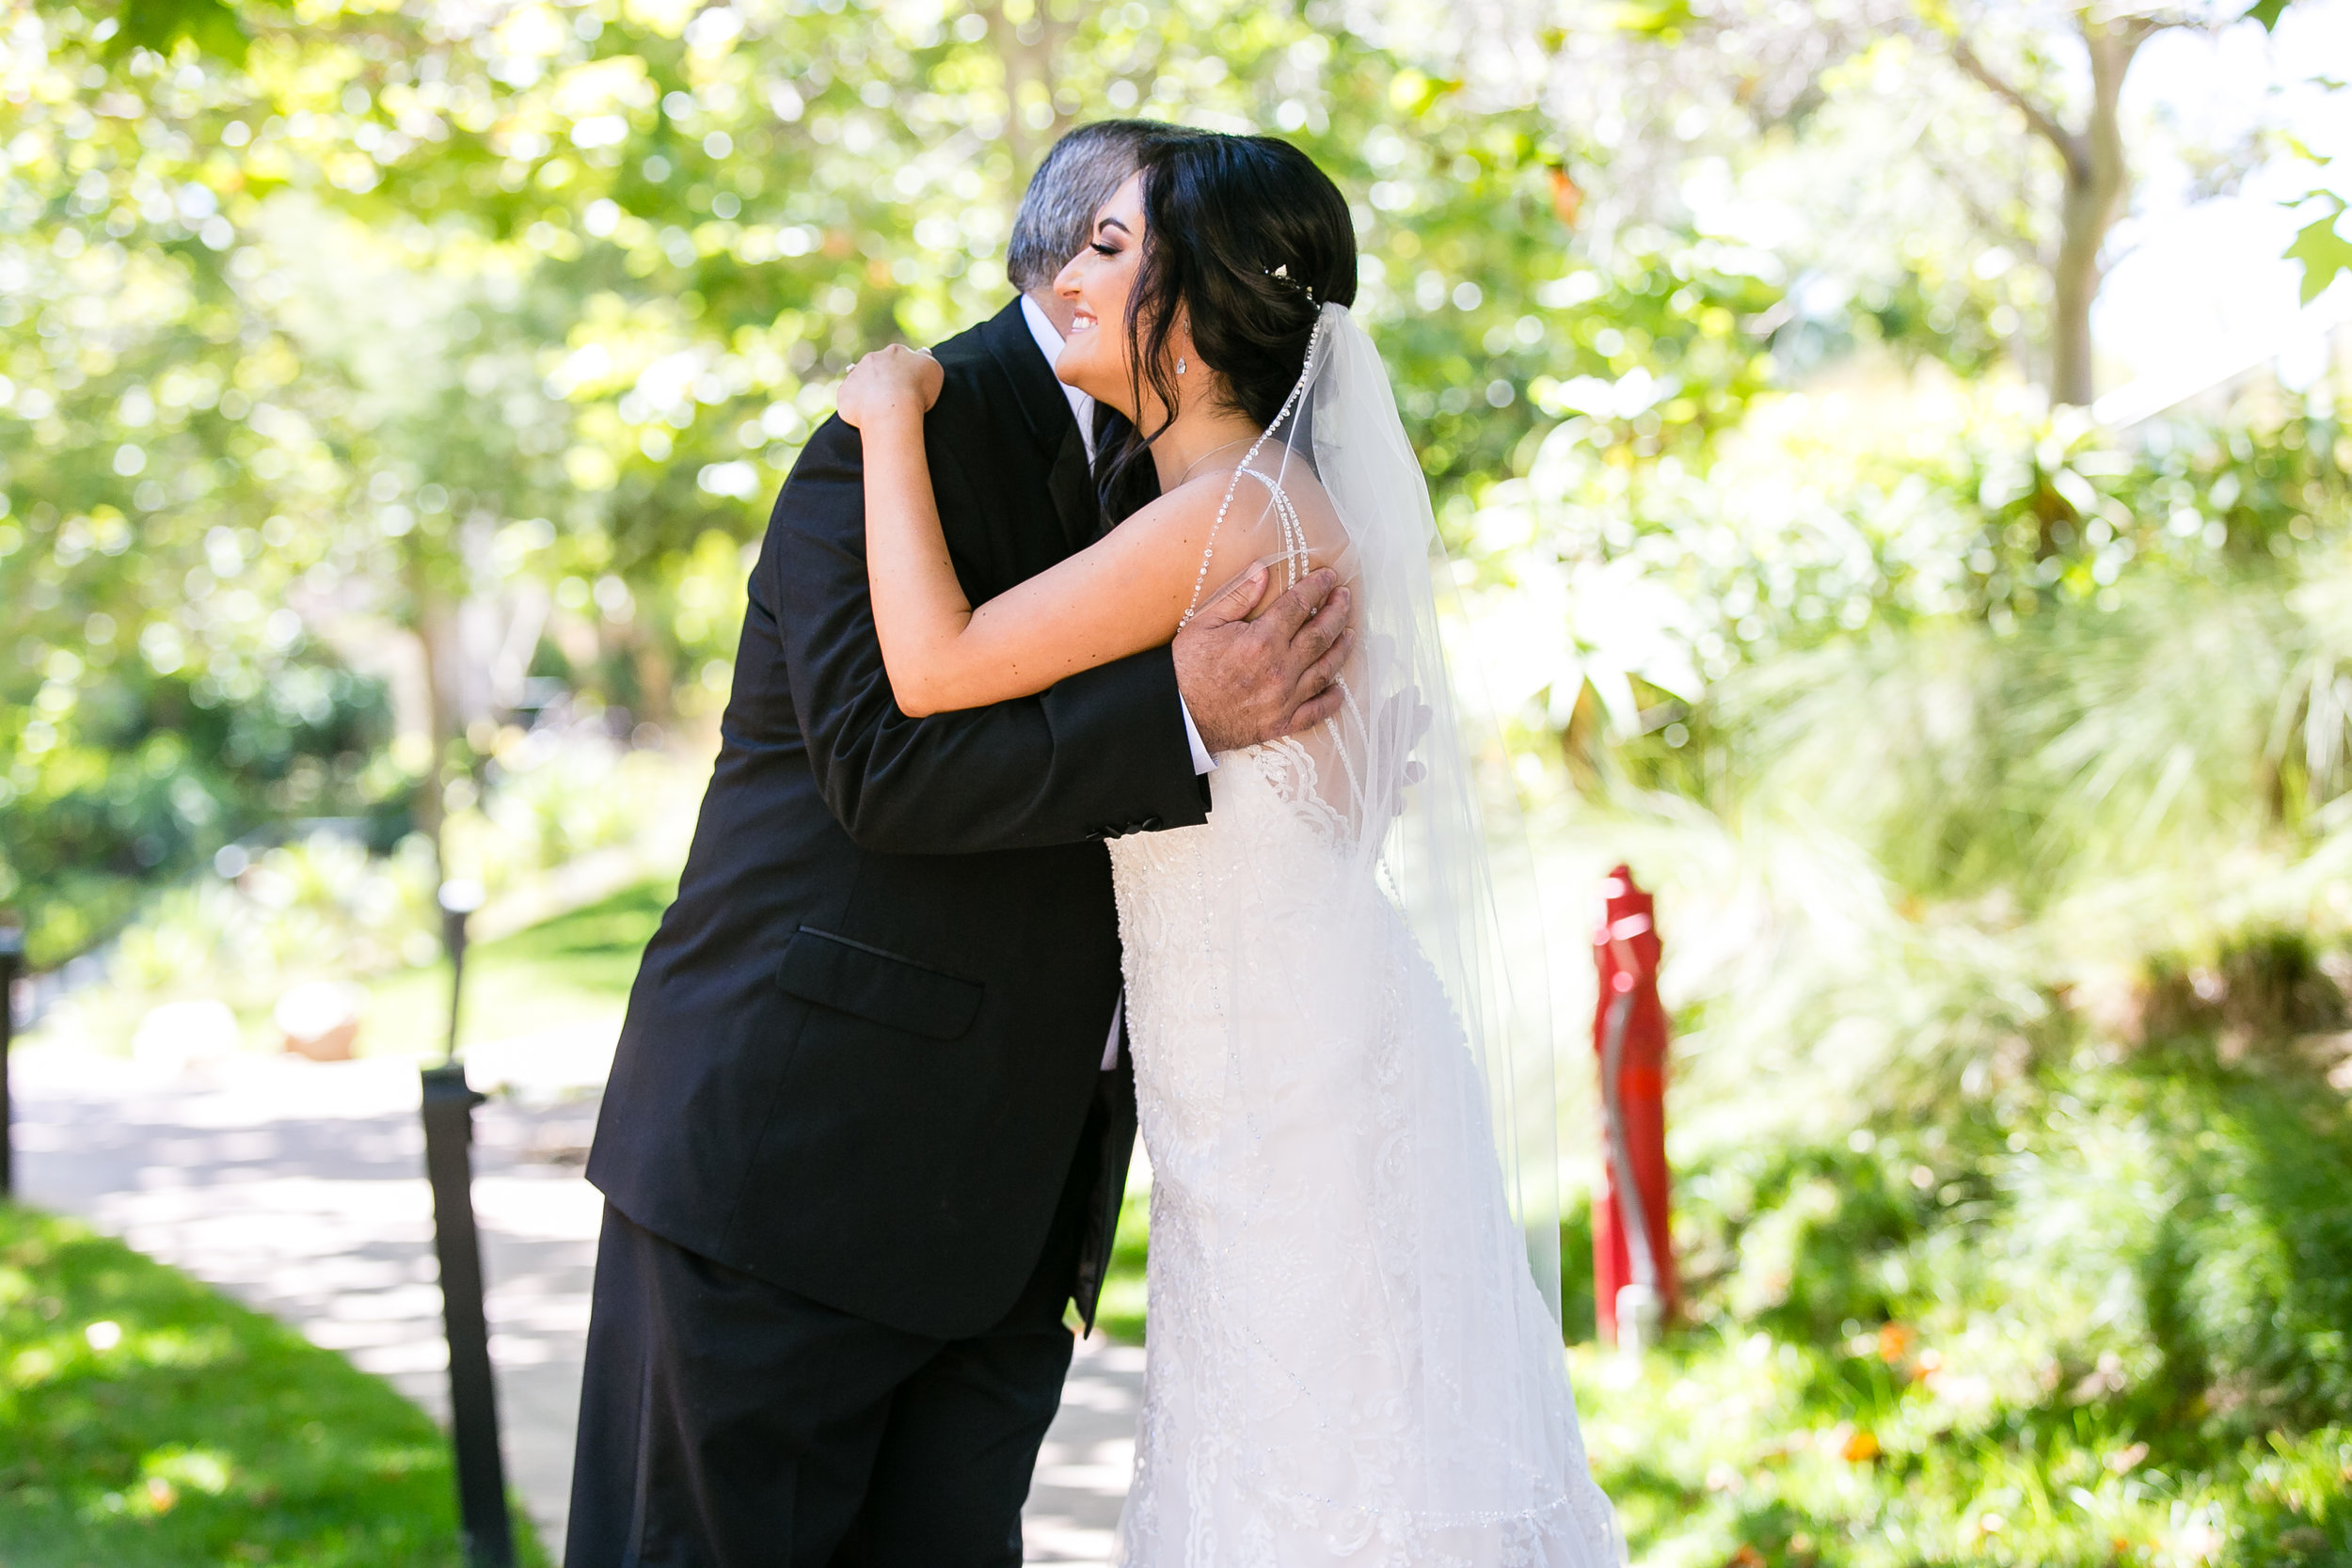 2019_05_24_Wedding_Barajas_0270.jpg